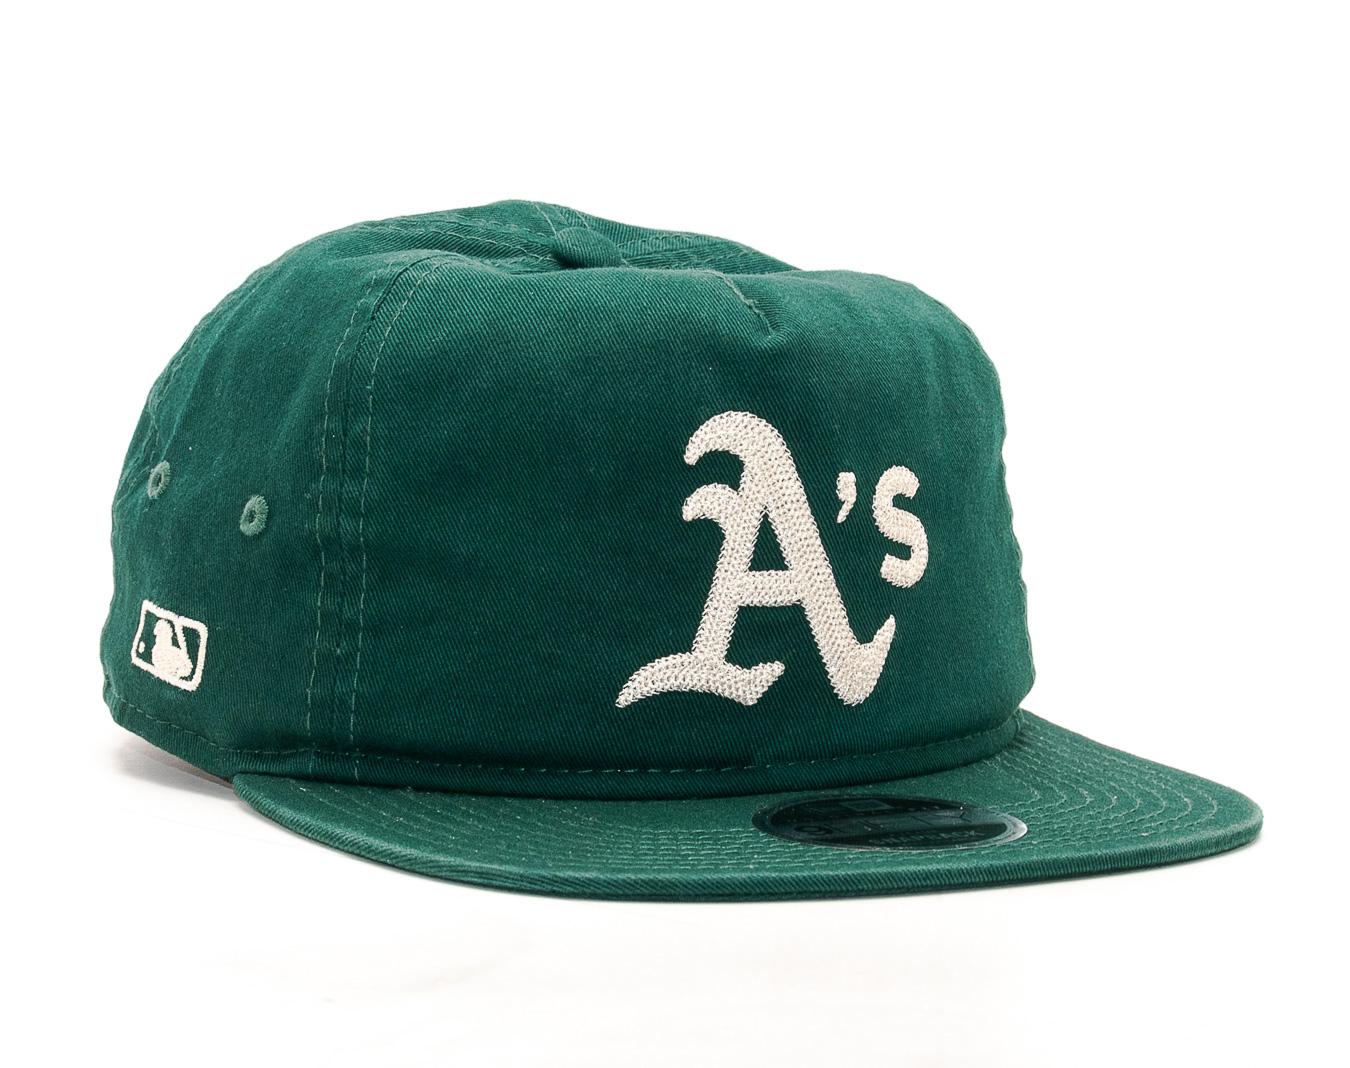 Kšiltovka New Era Chain Stitch Oakland Athletics 9FIFTY Dark Green  Snapback. Kšiltovka New ... be5f321ede09